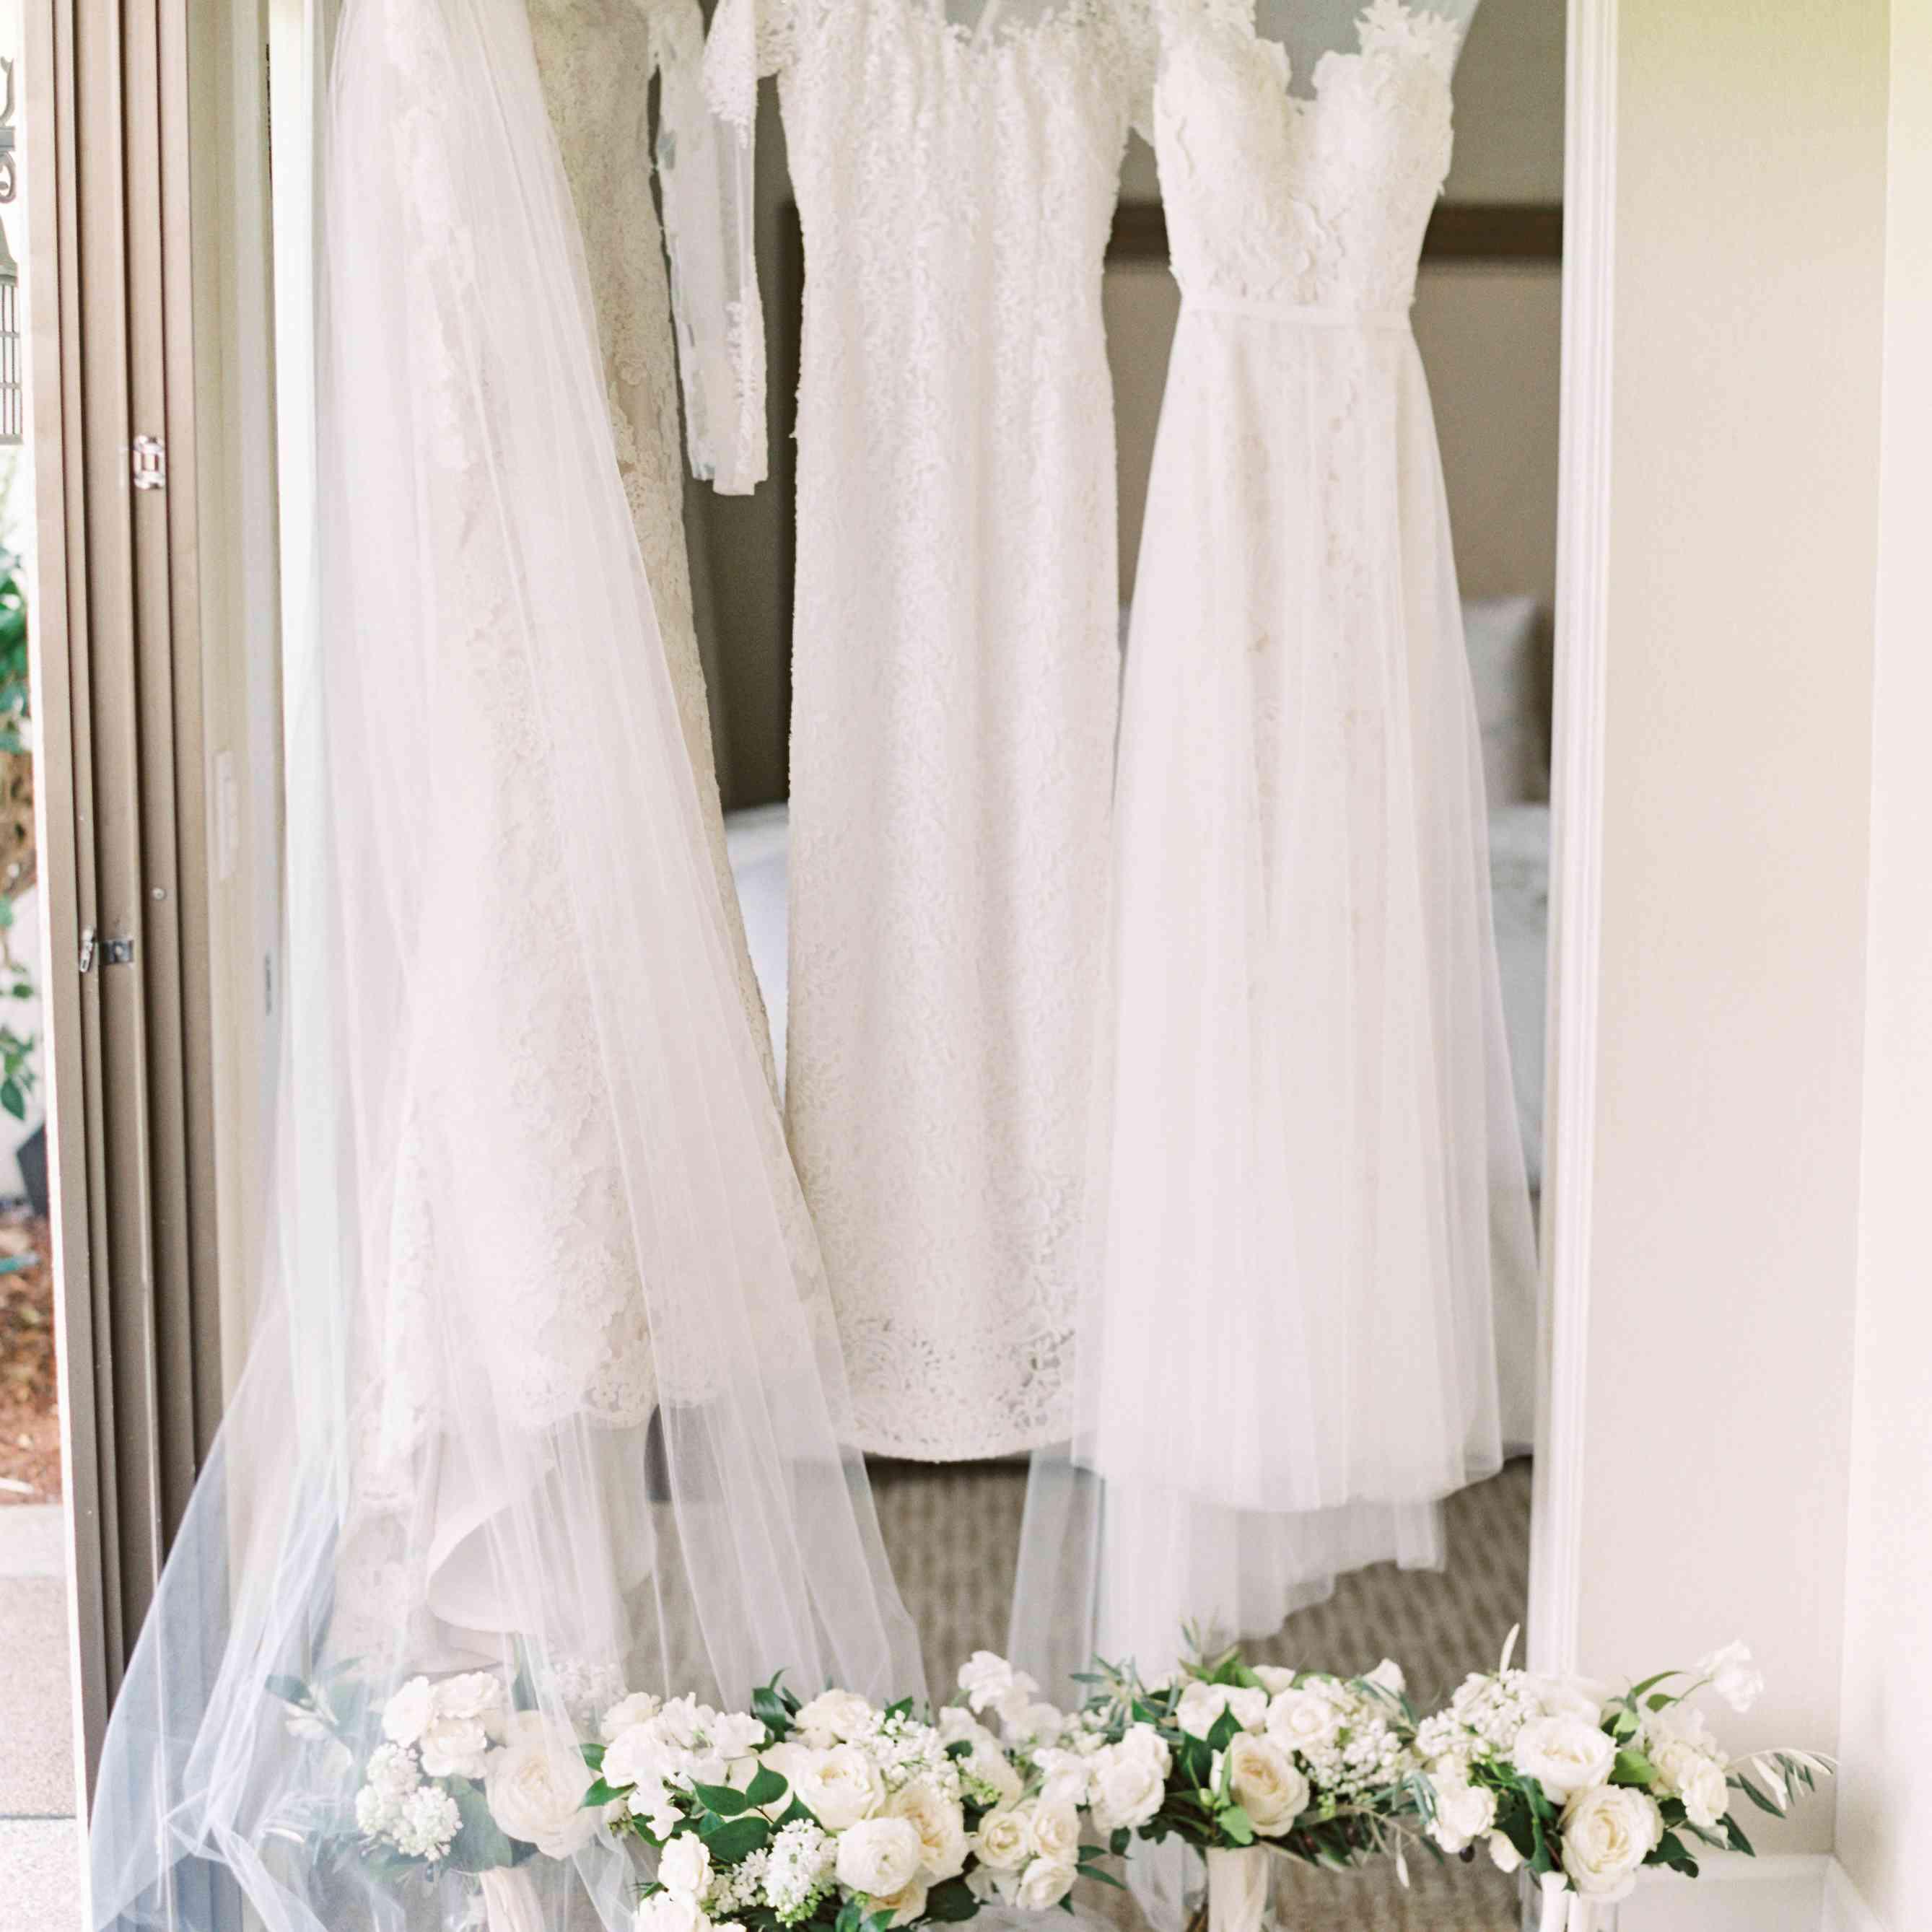 three wedding dresses